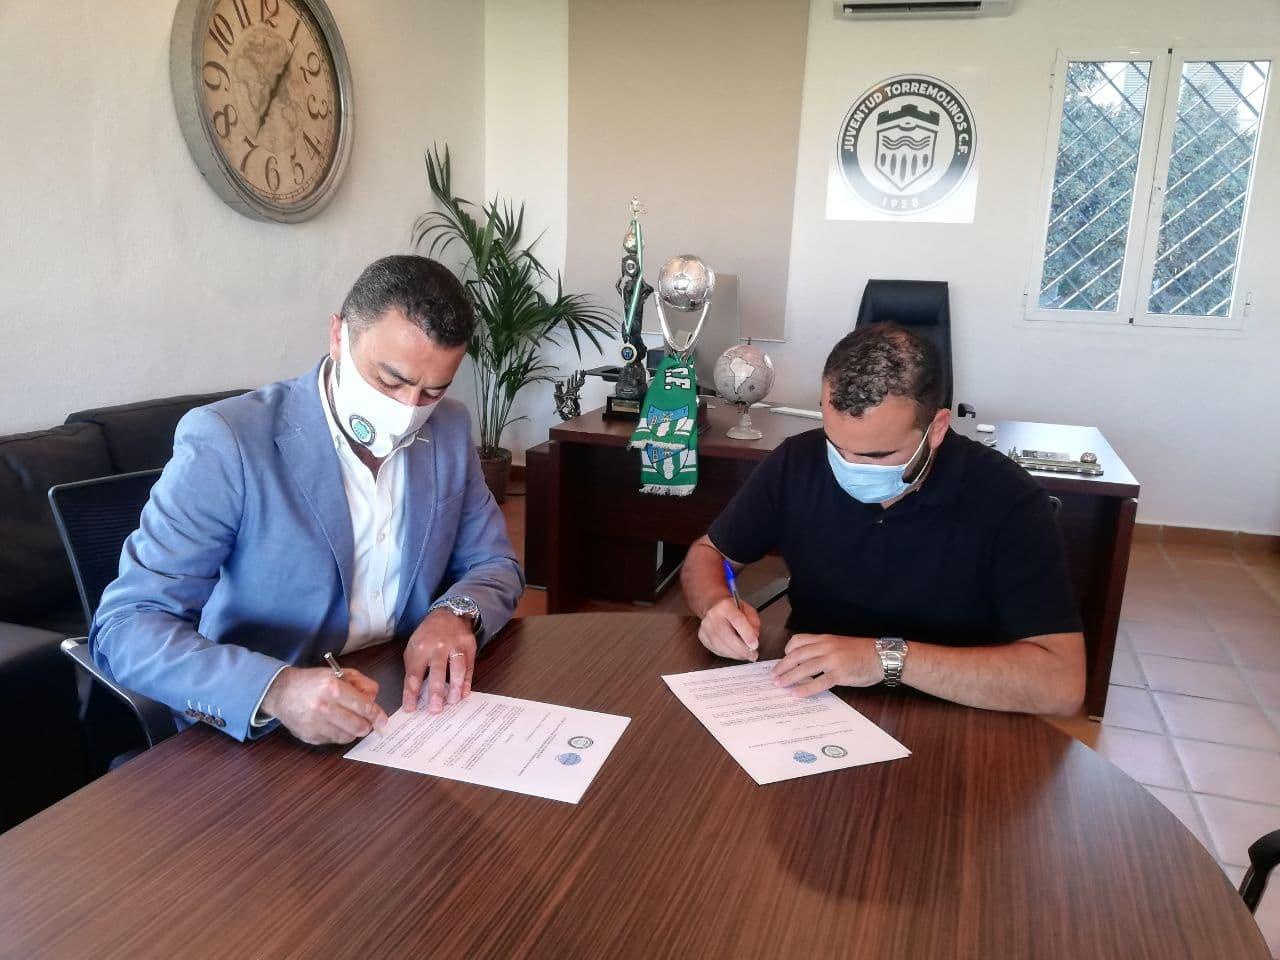 Firma Mariscos Paco Ramos como colaborador 21-22